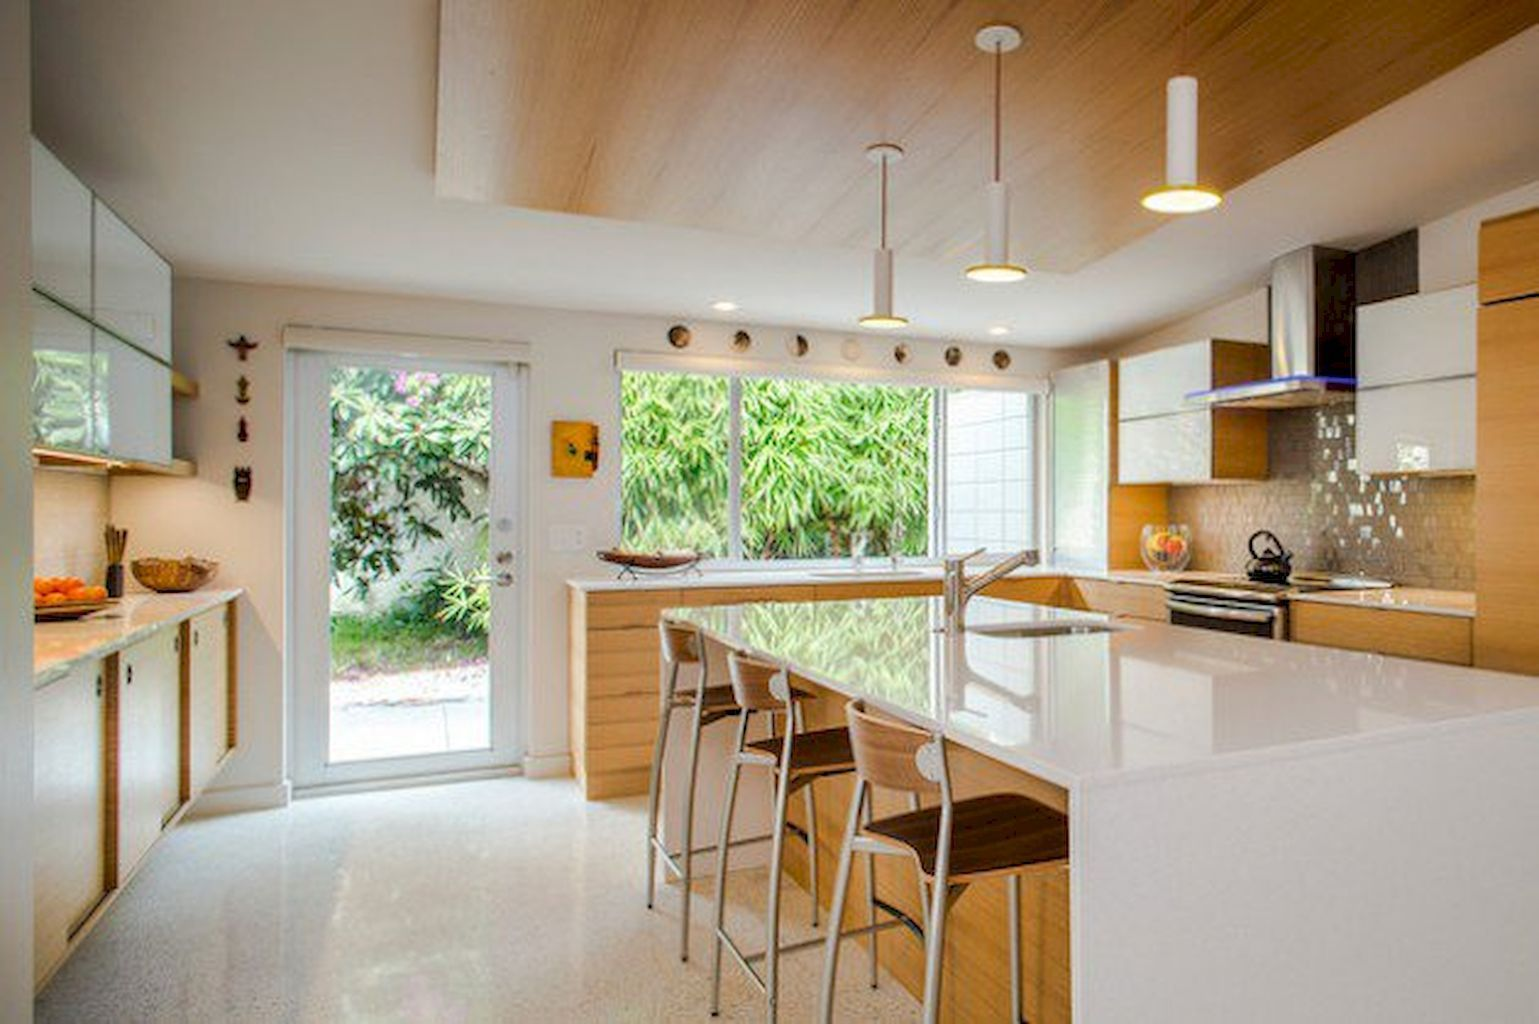 80 Modern Mid Century Kitchen Remodel Ideas  Mid Century Pleasing Remodeling Kitchen Design Ideas